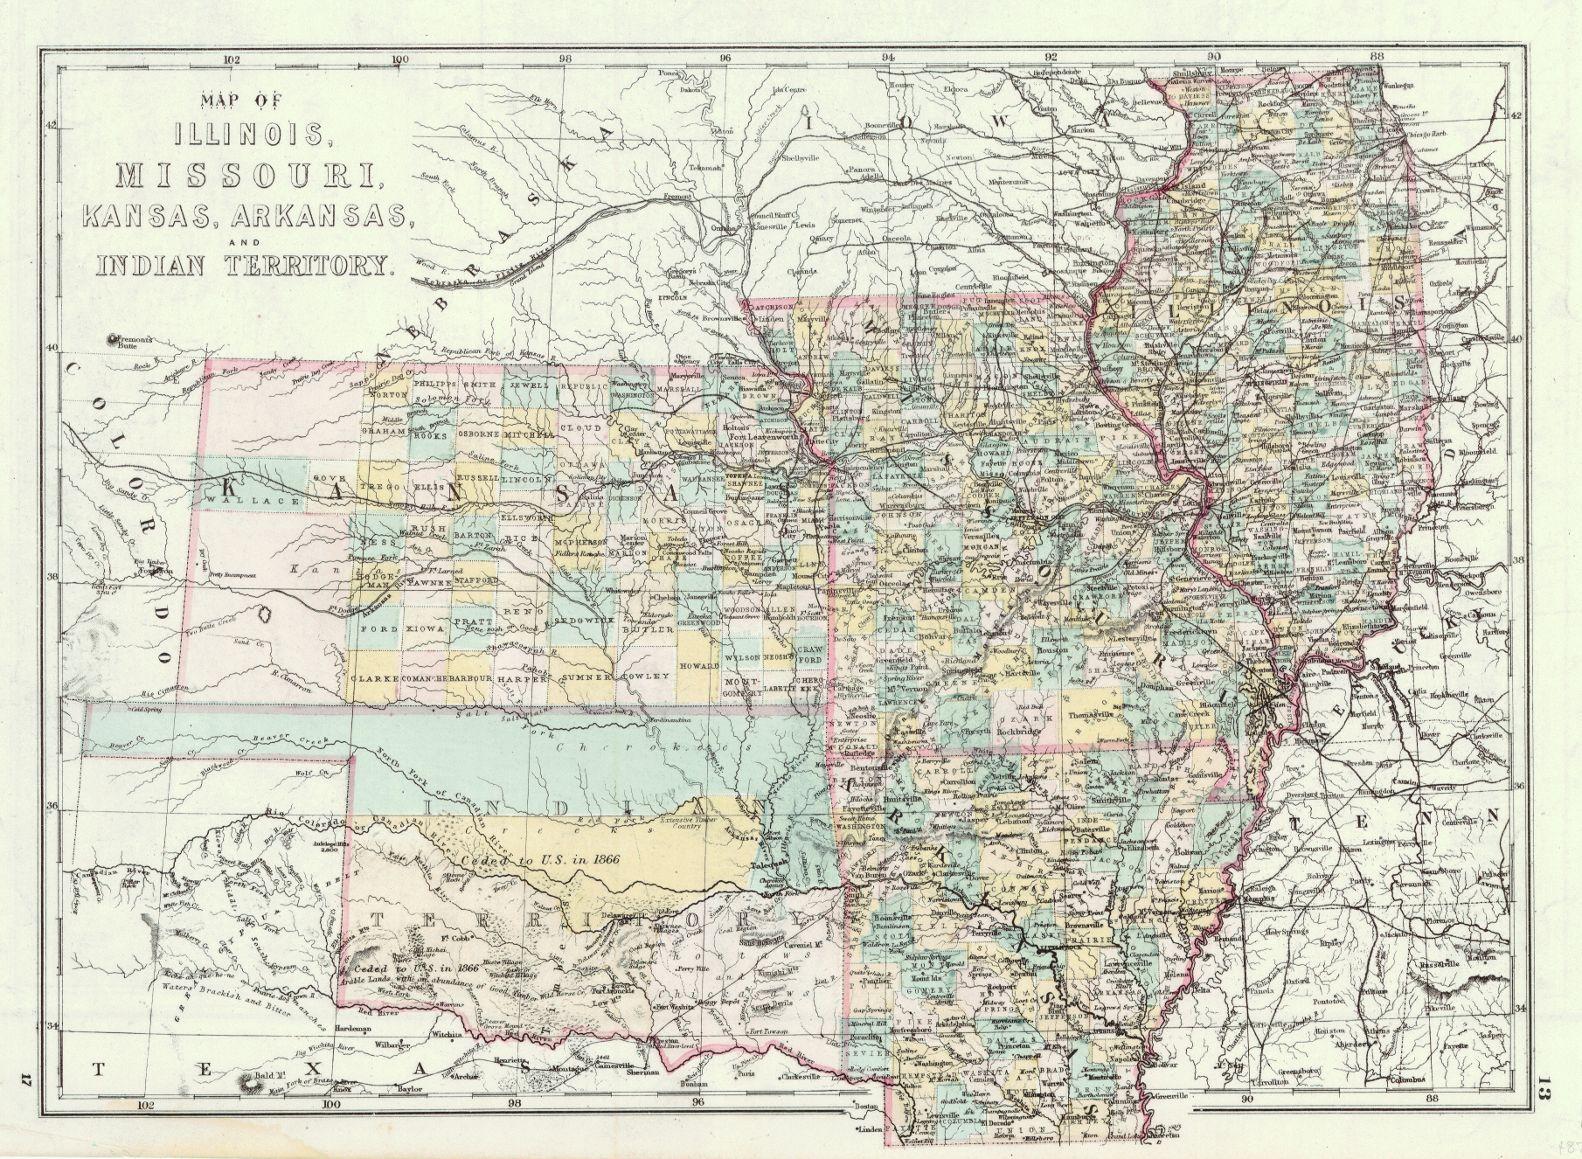 Map Of Illinois Missouri Kansas Arkansas And Indian Territory - Detailed map of kansas